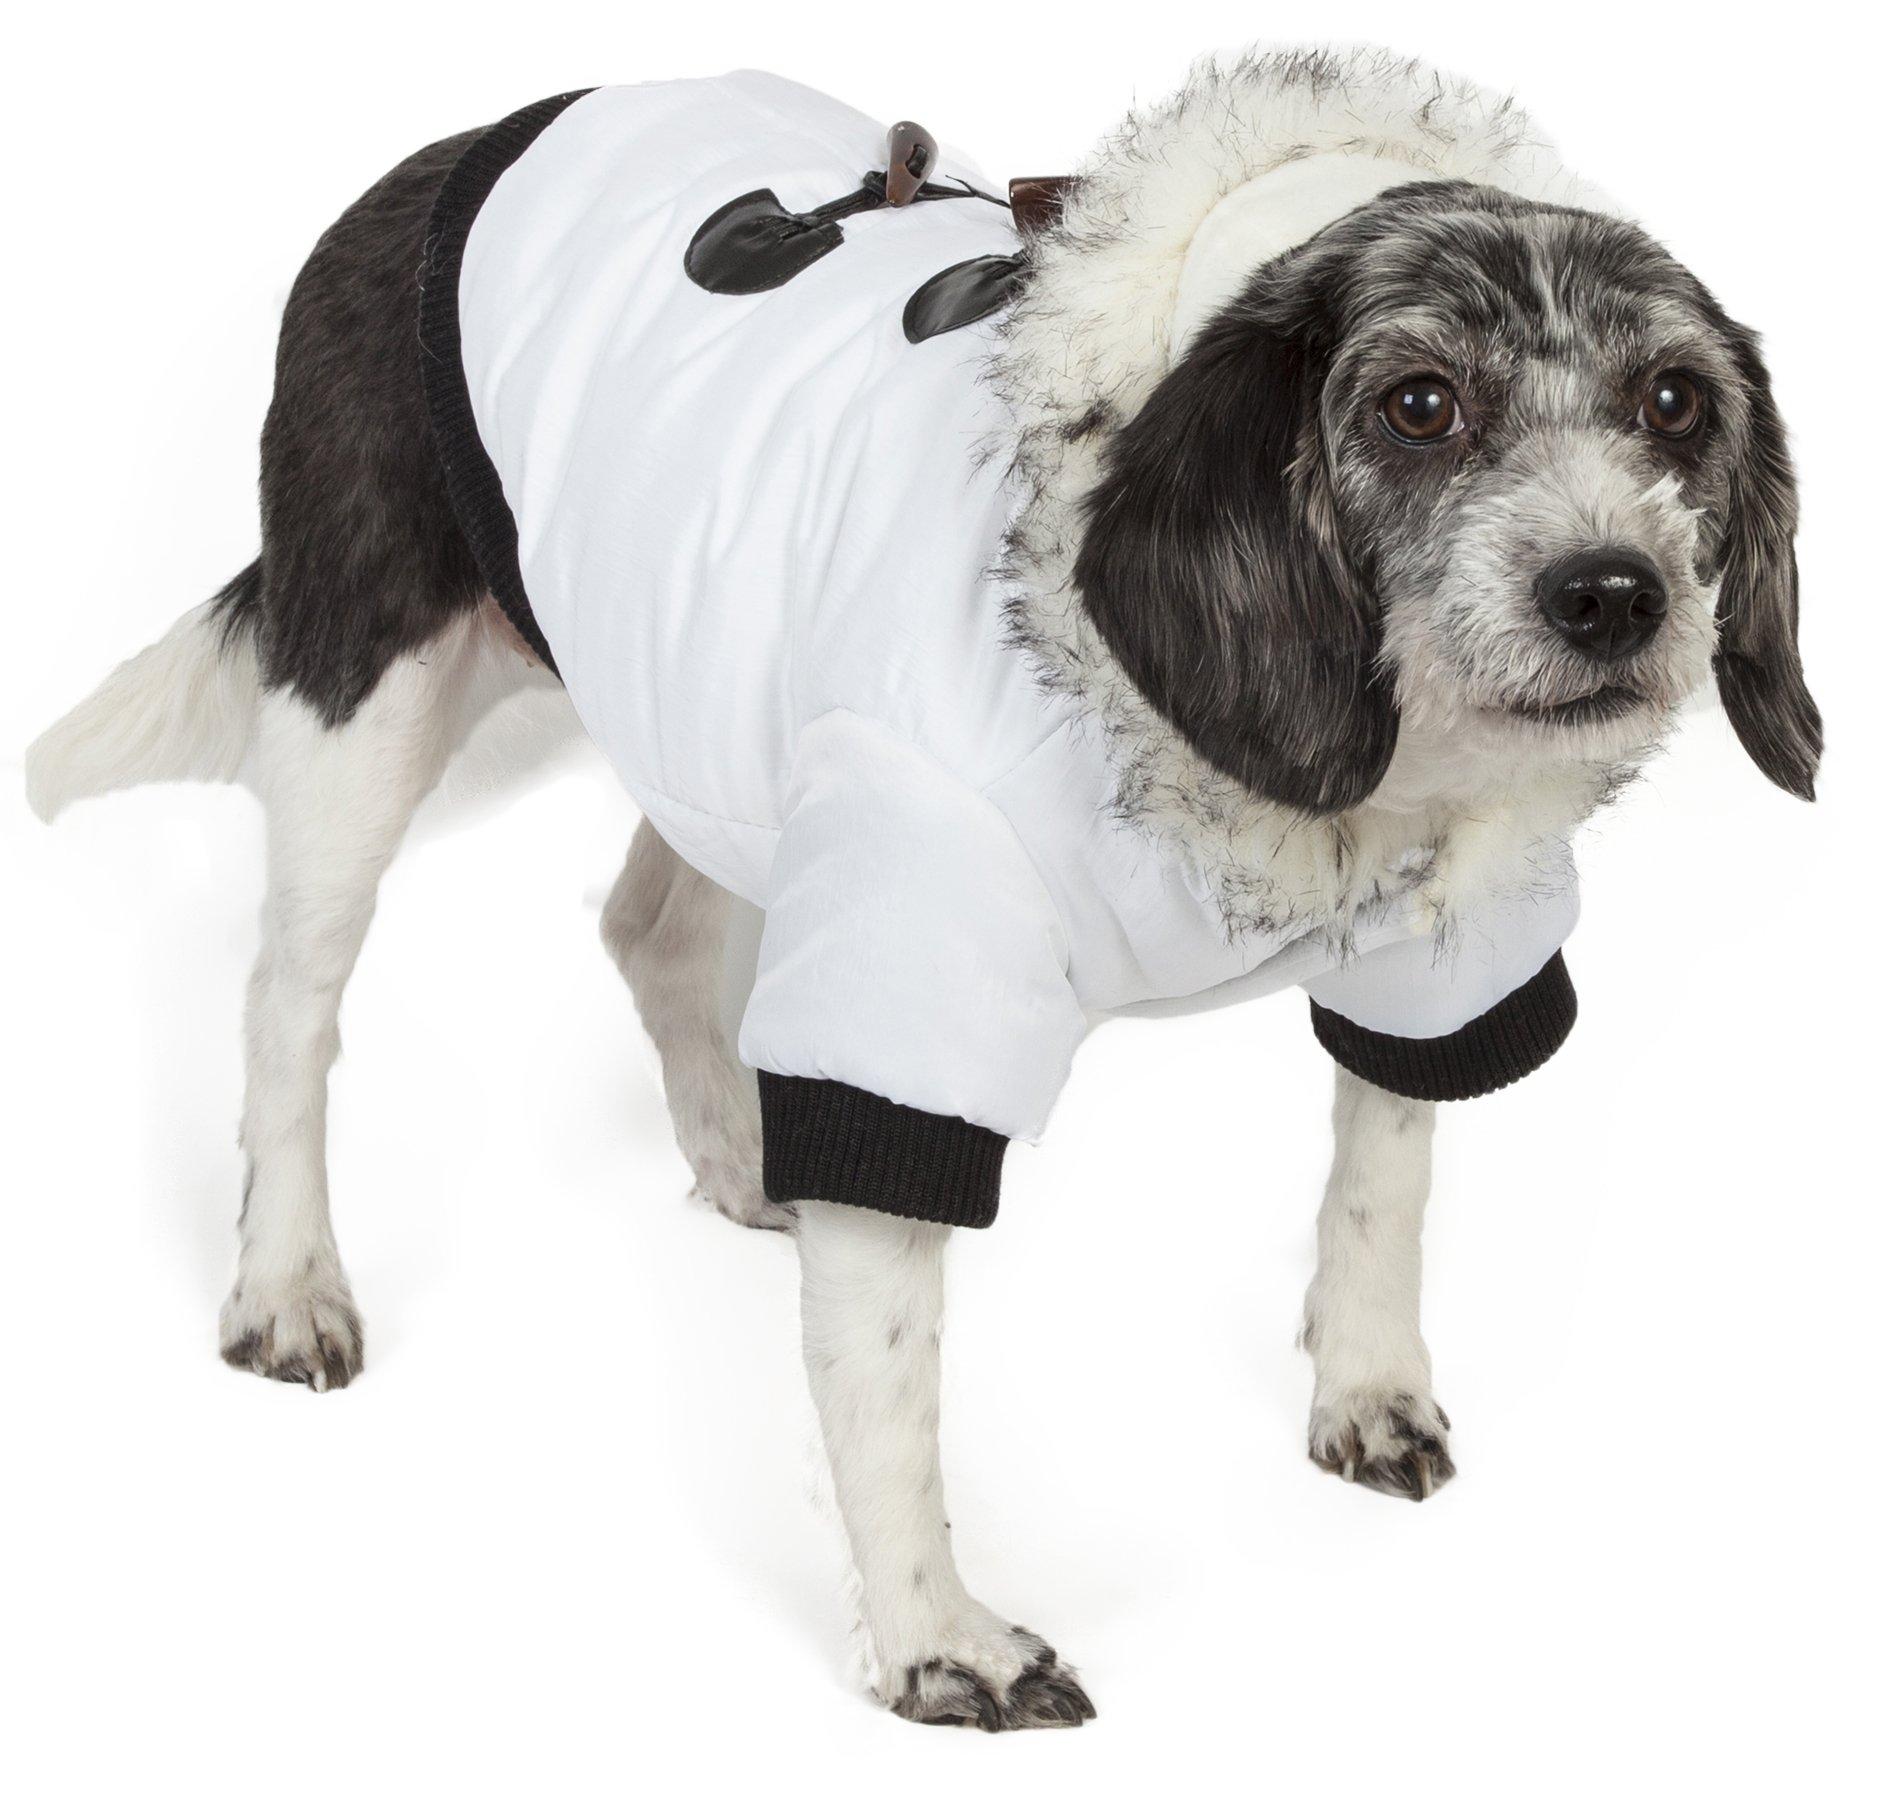 Pet Life Fashion Designer Aspen Winter-White Parka Pet Dog Coat Jacket w/3M Insulation Technology, X-Small, Winter White